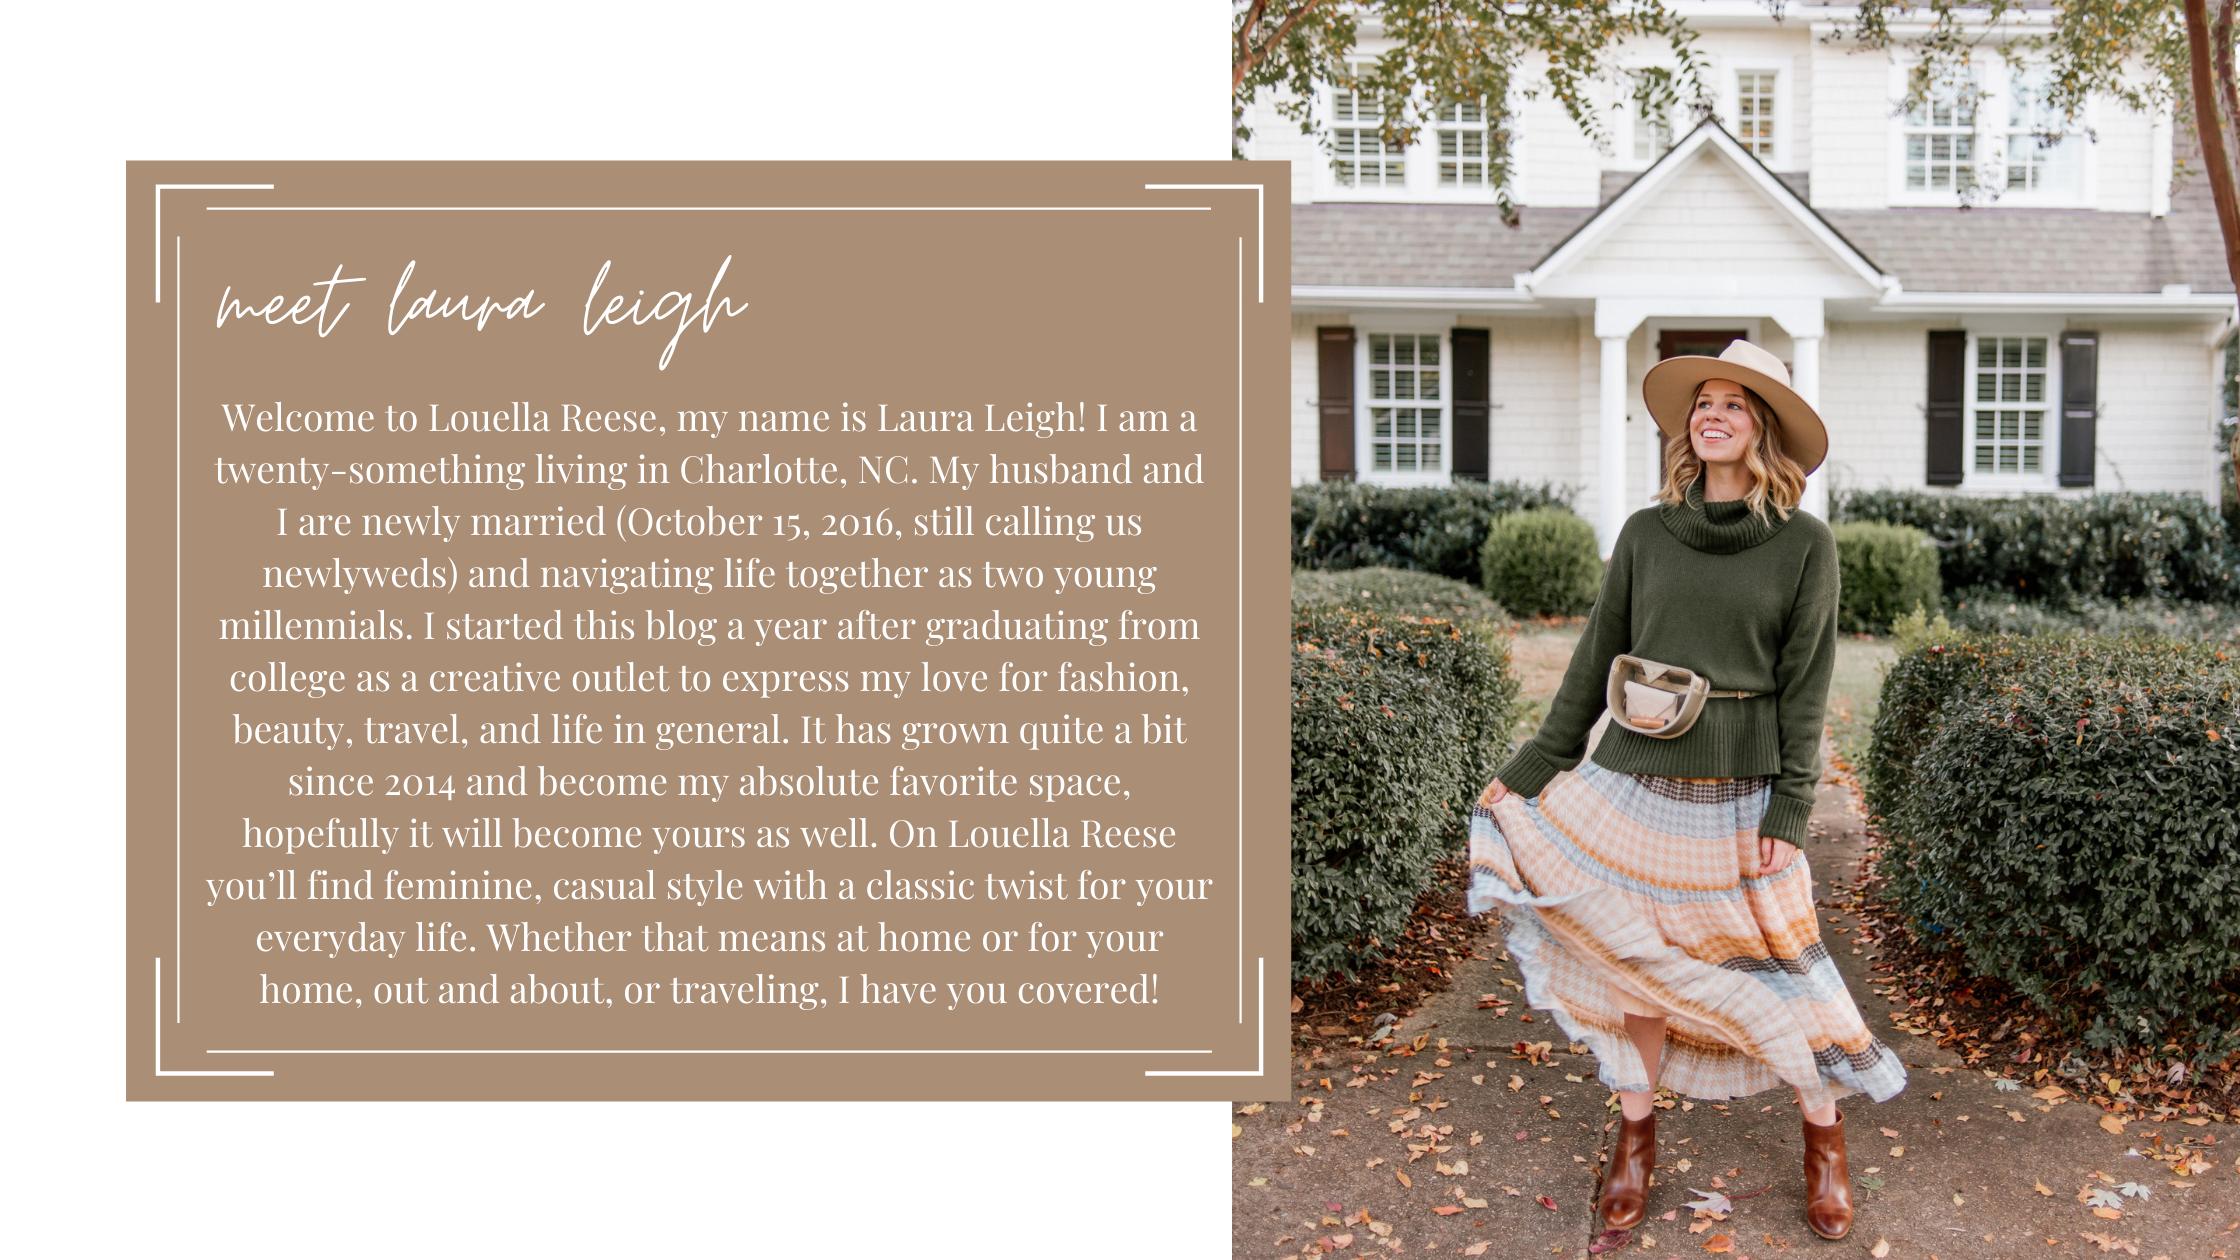 Louella Reese-Meet Laura Leigh Elliott of Louella Reese